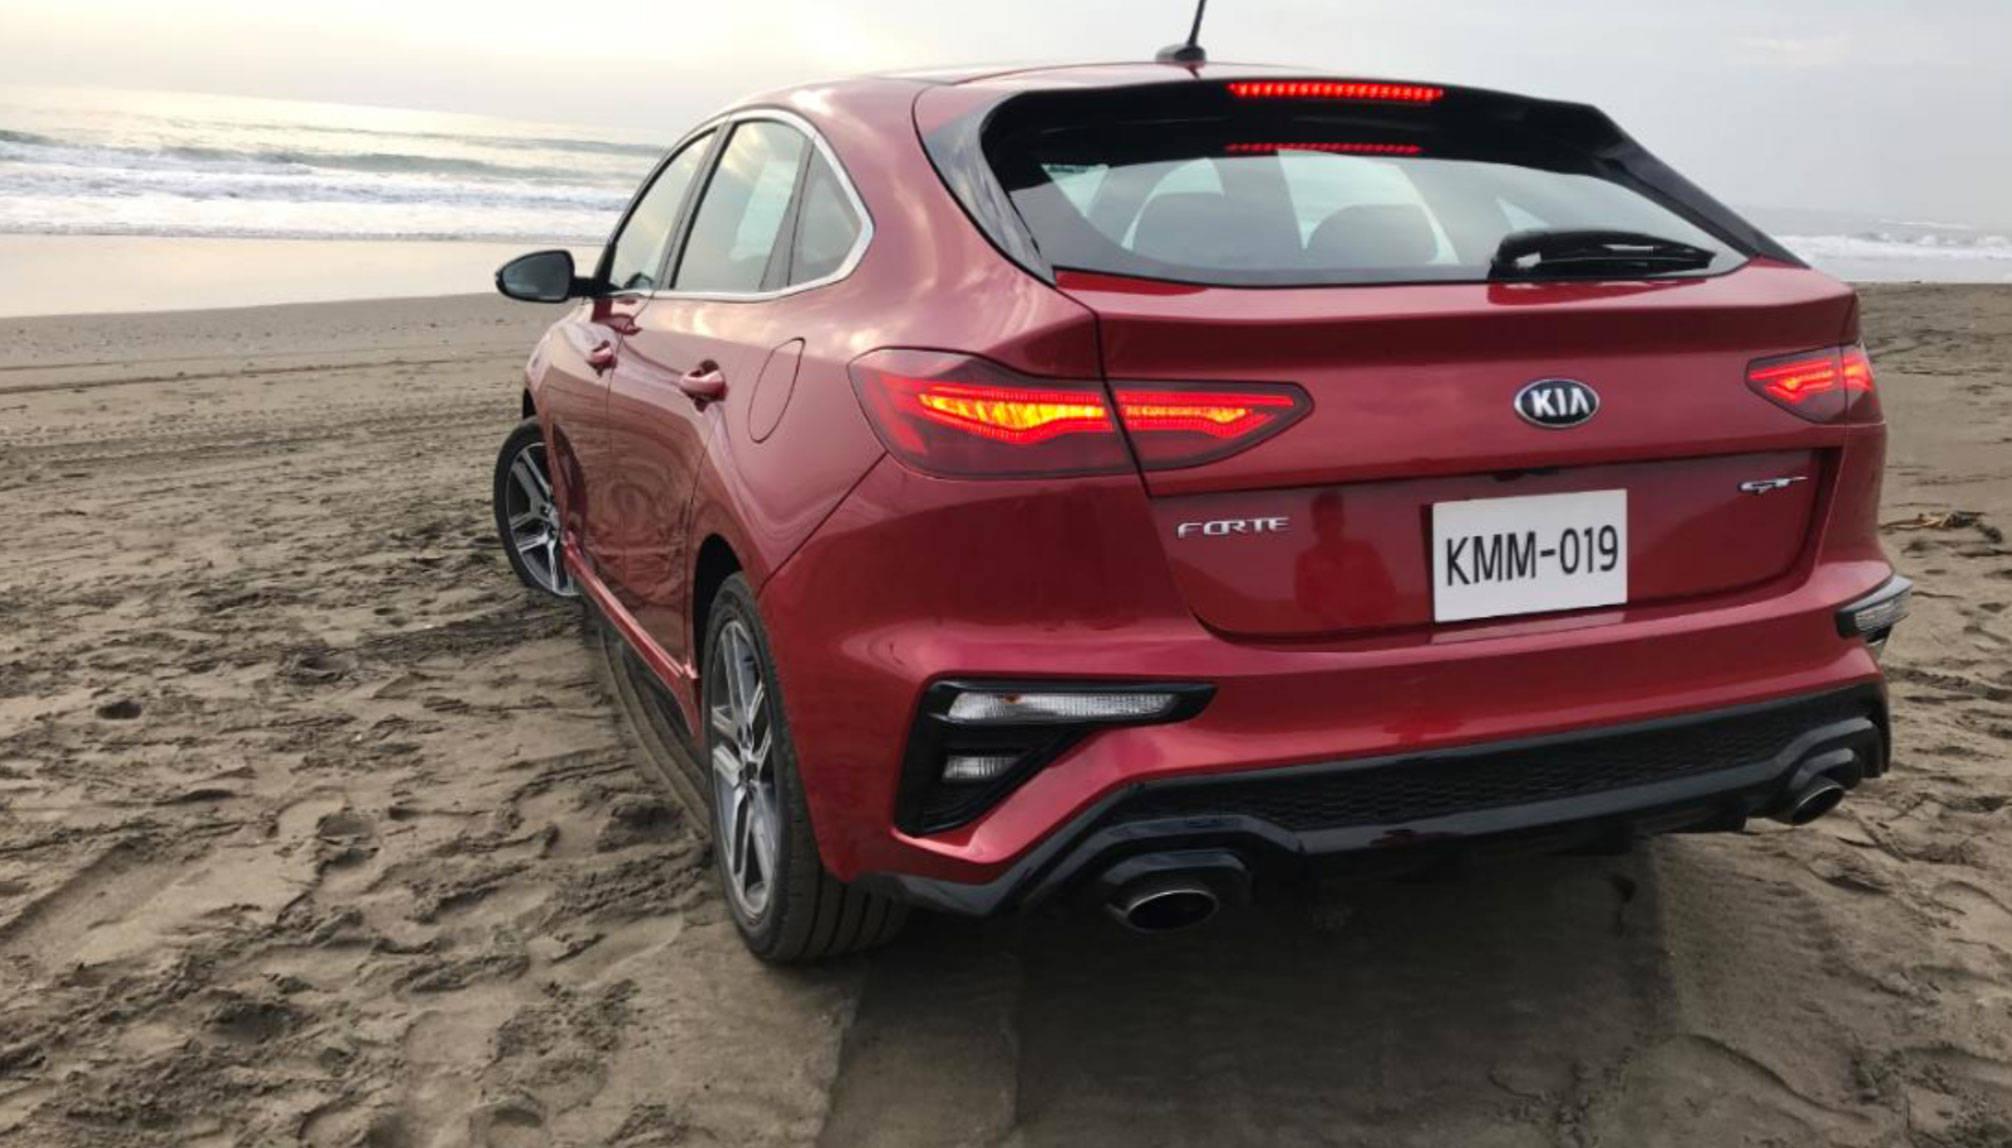 Fer Guisa descubre Veracruz en un KIA Forte GT hatchback 0c8cc4703e